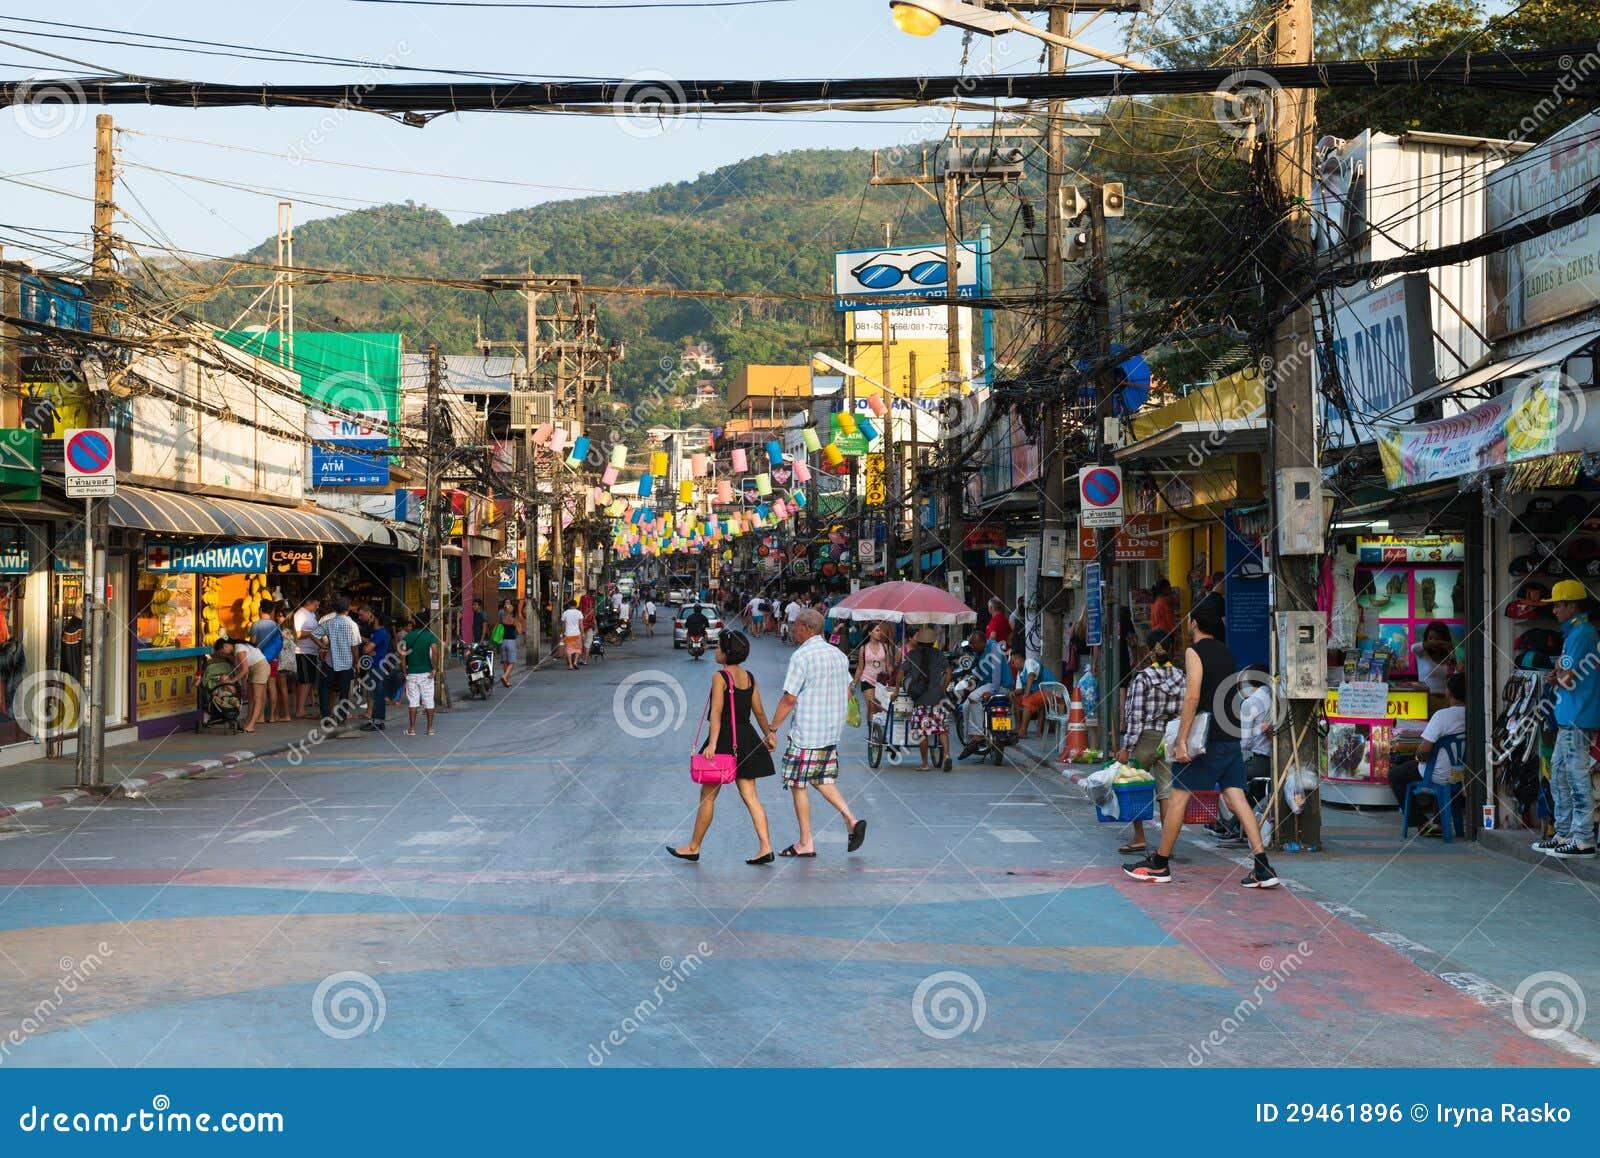 patong bangla road at day phuket thailand editorial. Black Bedroom Furniture Sets. Home Design Ideas